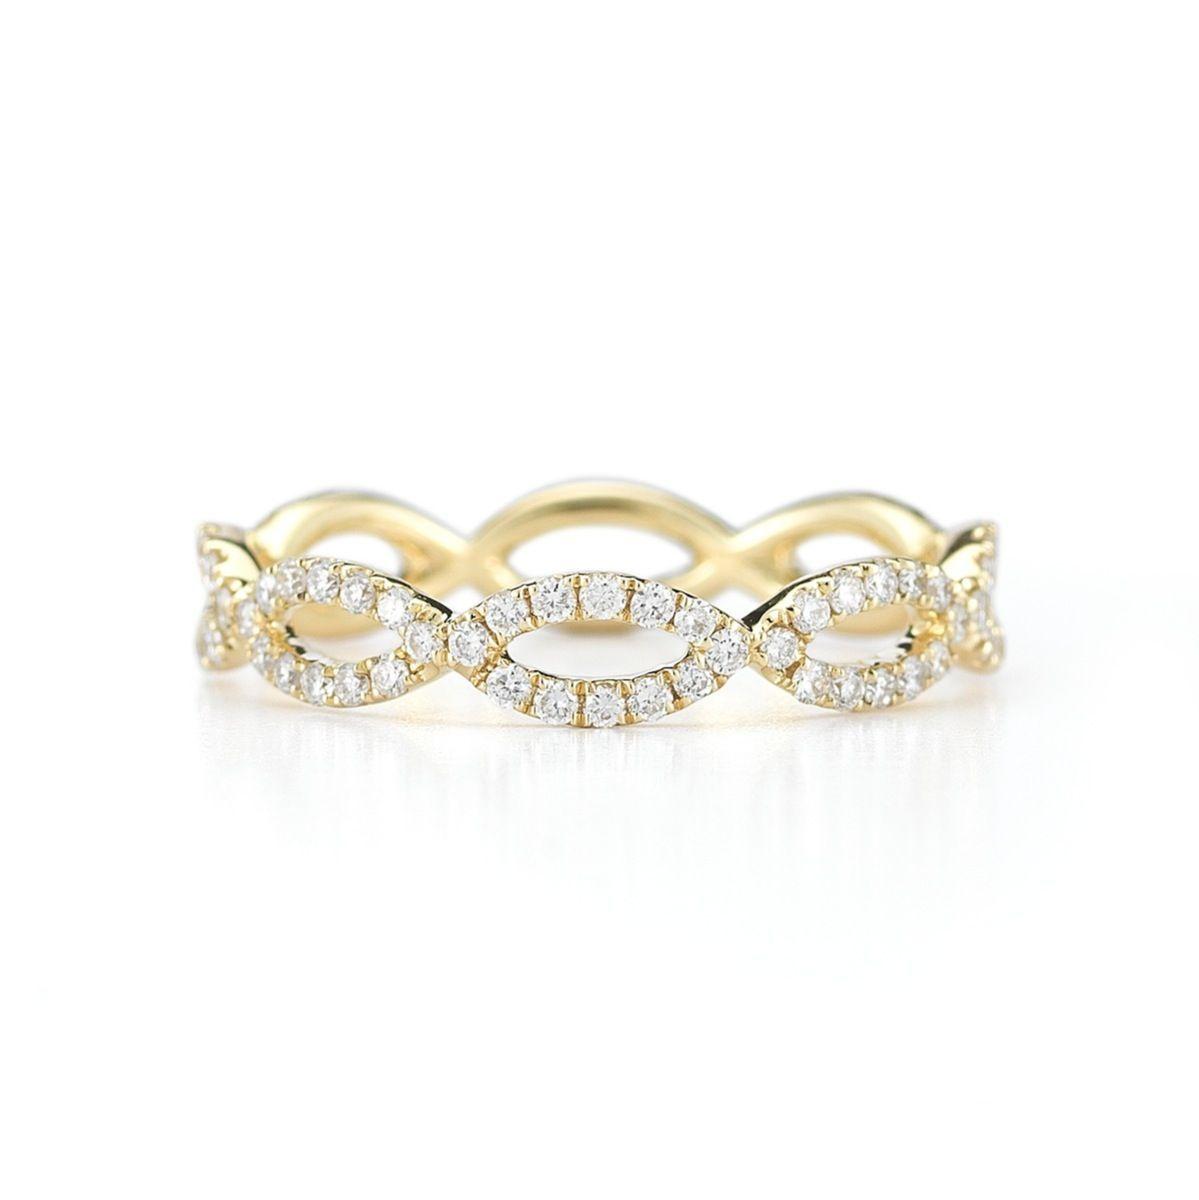 Sophia ryan diamond yellow gold infinity ring r jewelry